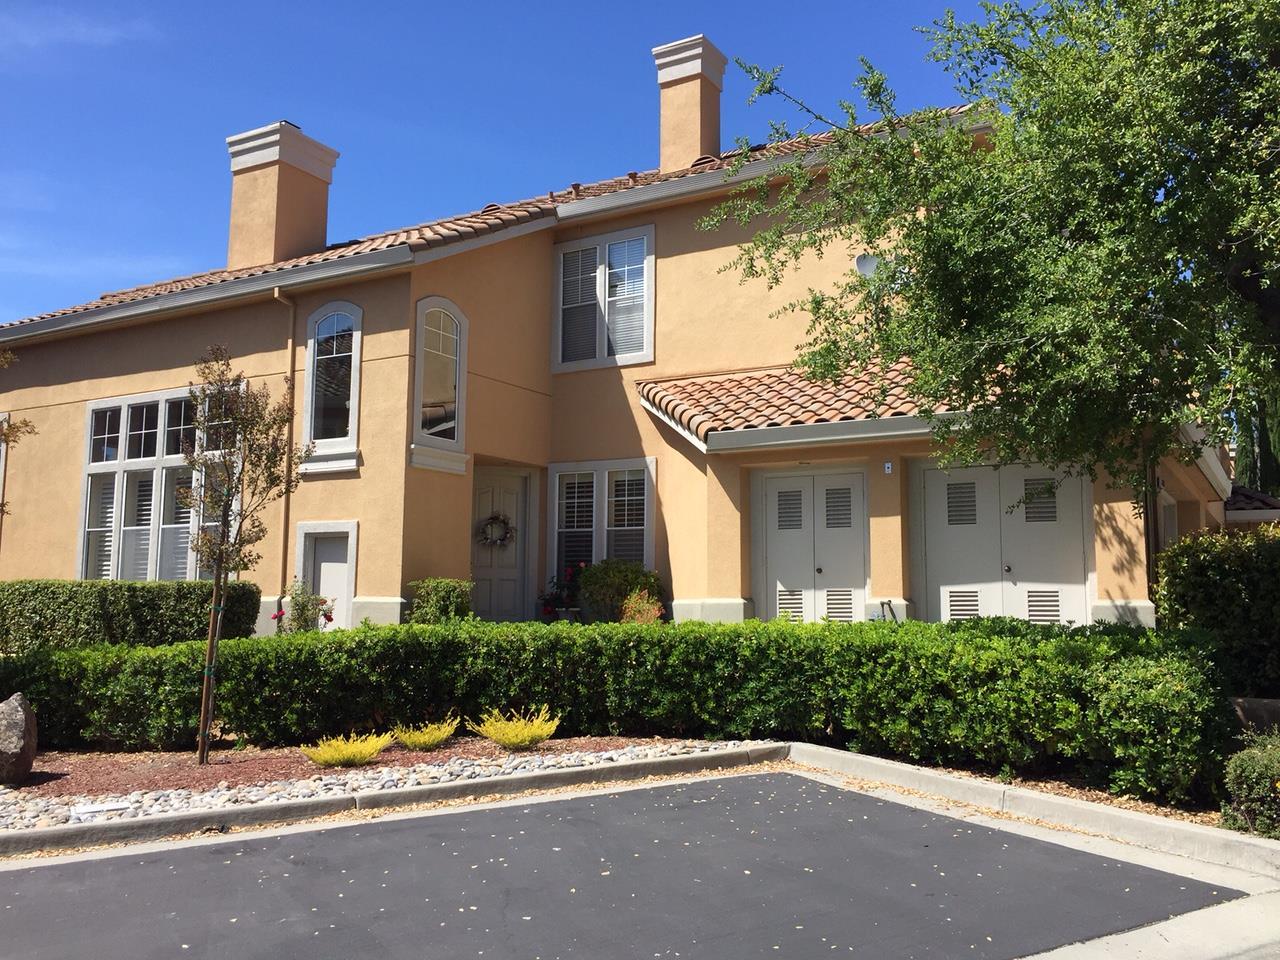 تاون هاوس للـ Sale في 6115 Country Club Parkway 6115 Country Club Parkway San Jose, California 95138 United States